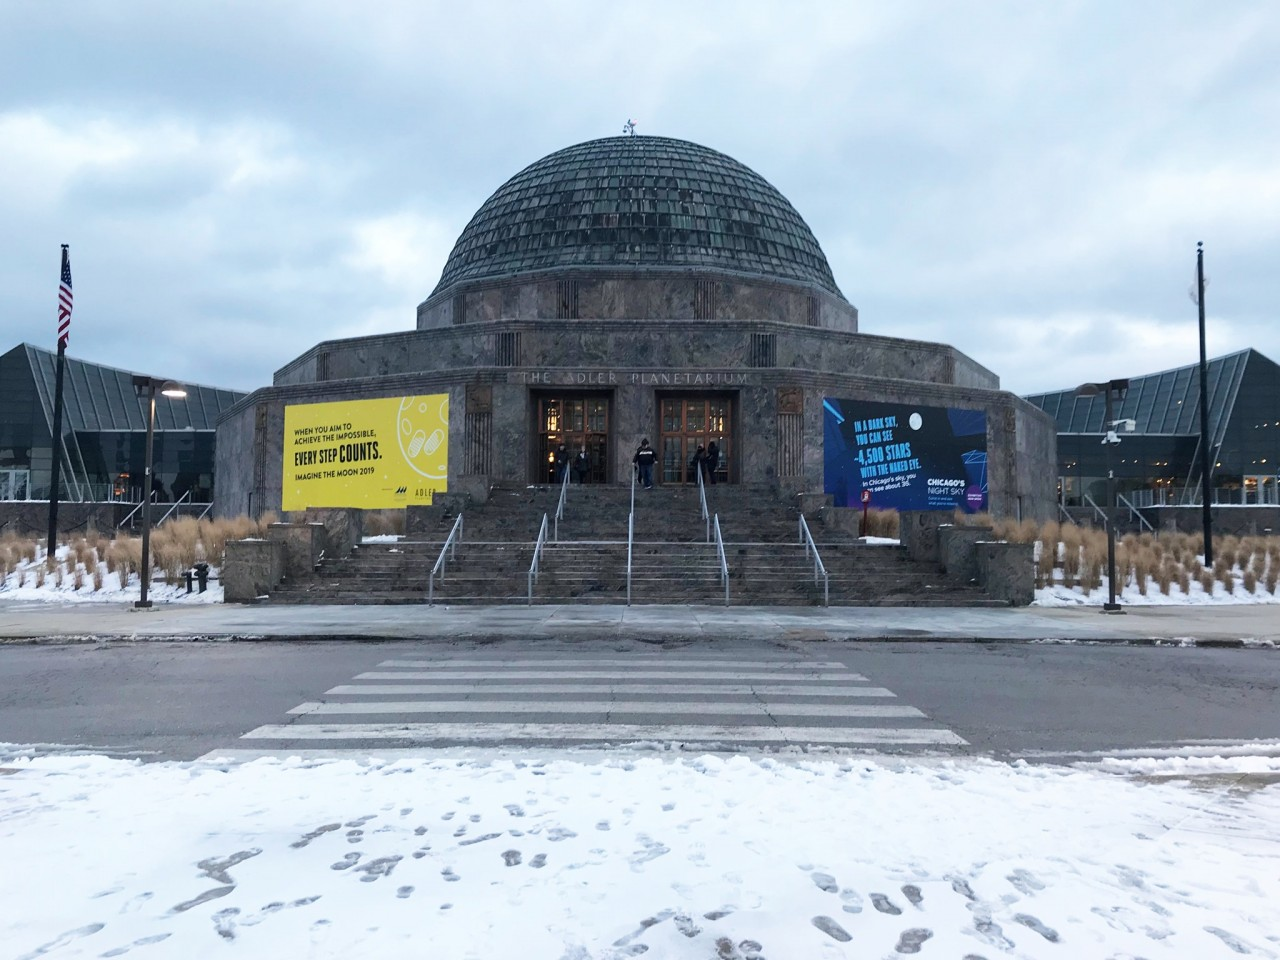 Adler Planetarium & Astronomy Museum(アドラープラネタリウム)